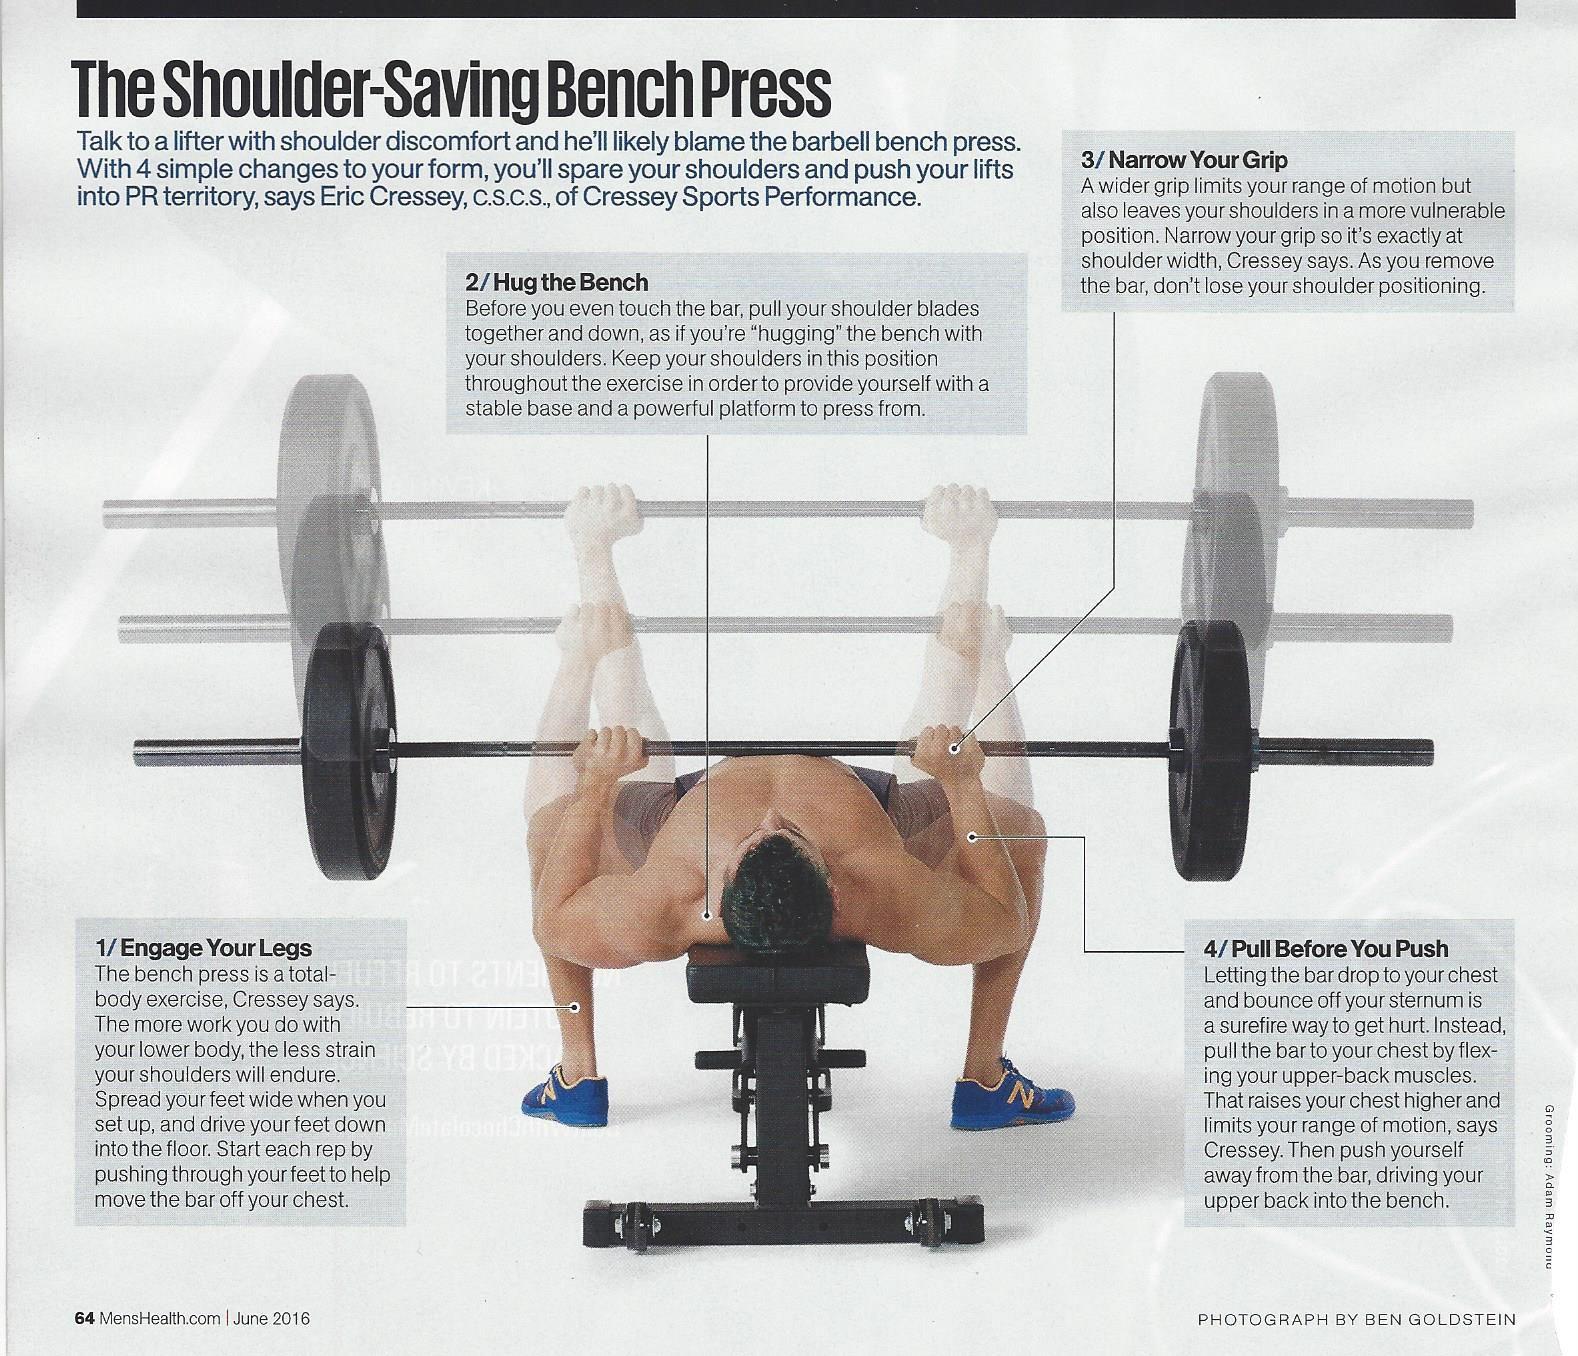 Bench press proper form from menshealthmag ns health fitness bench press proper form from menshealthmag ns falaconquin